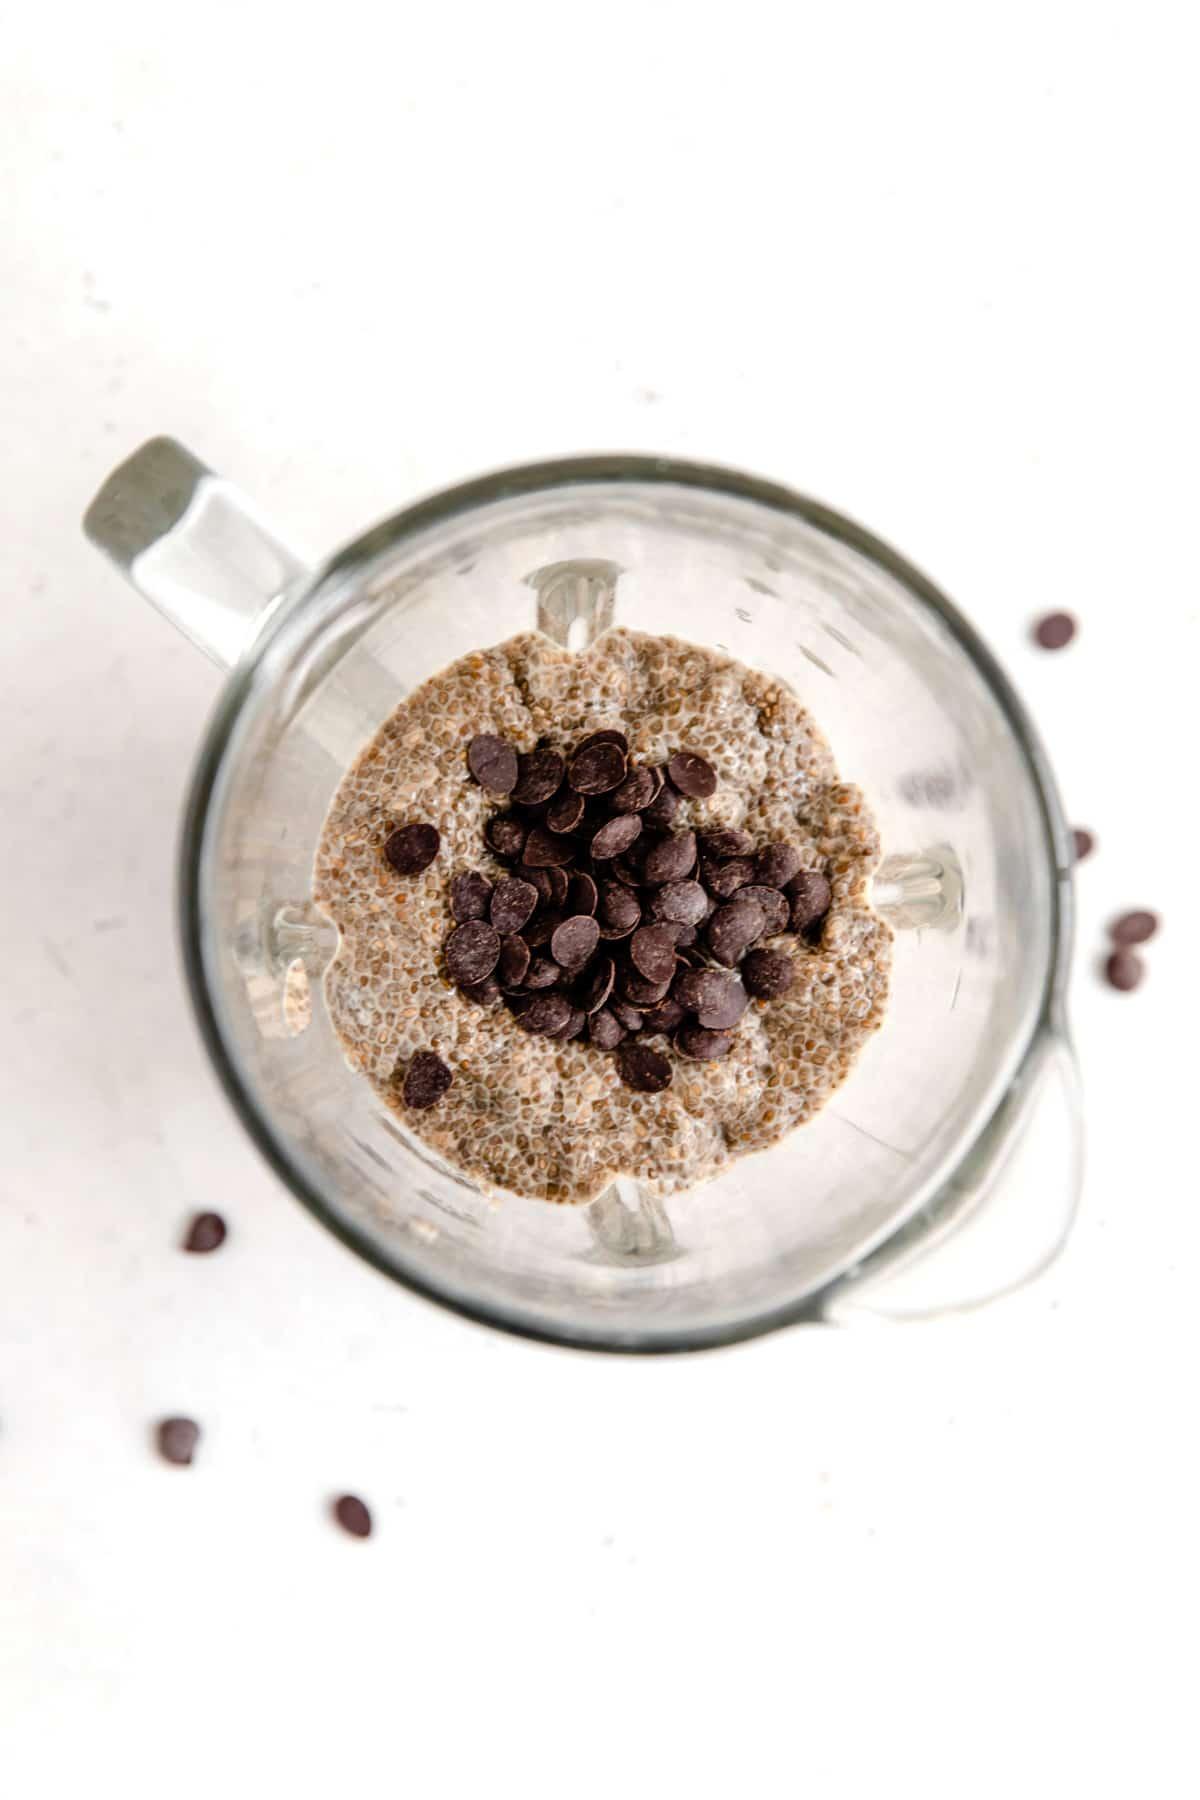 Espresso chia pudding in a blender